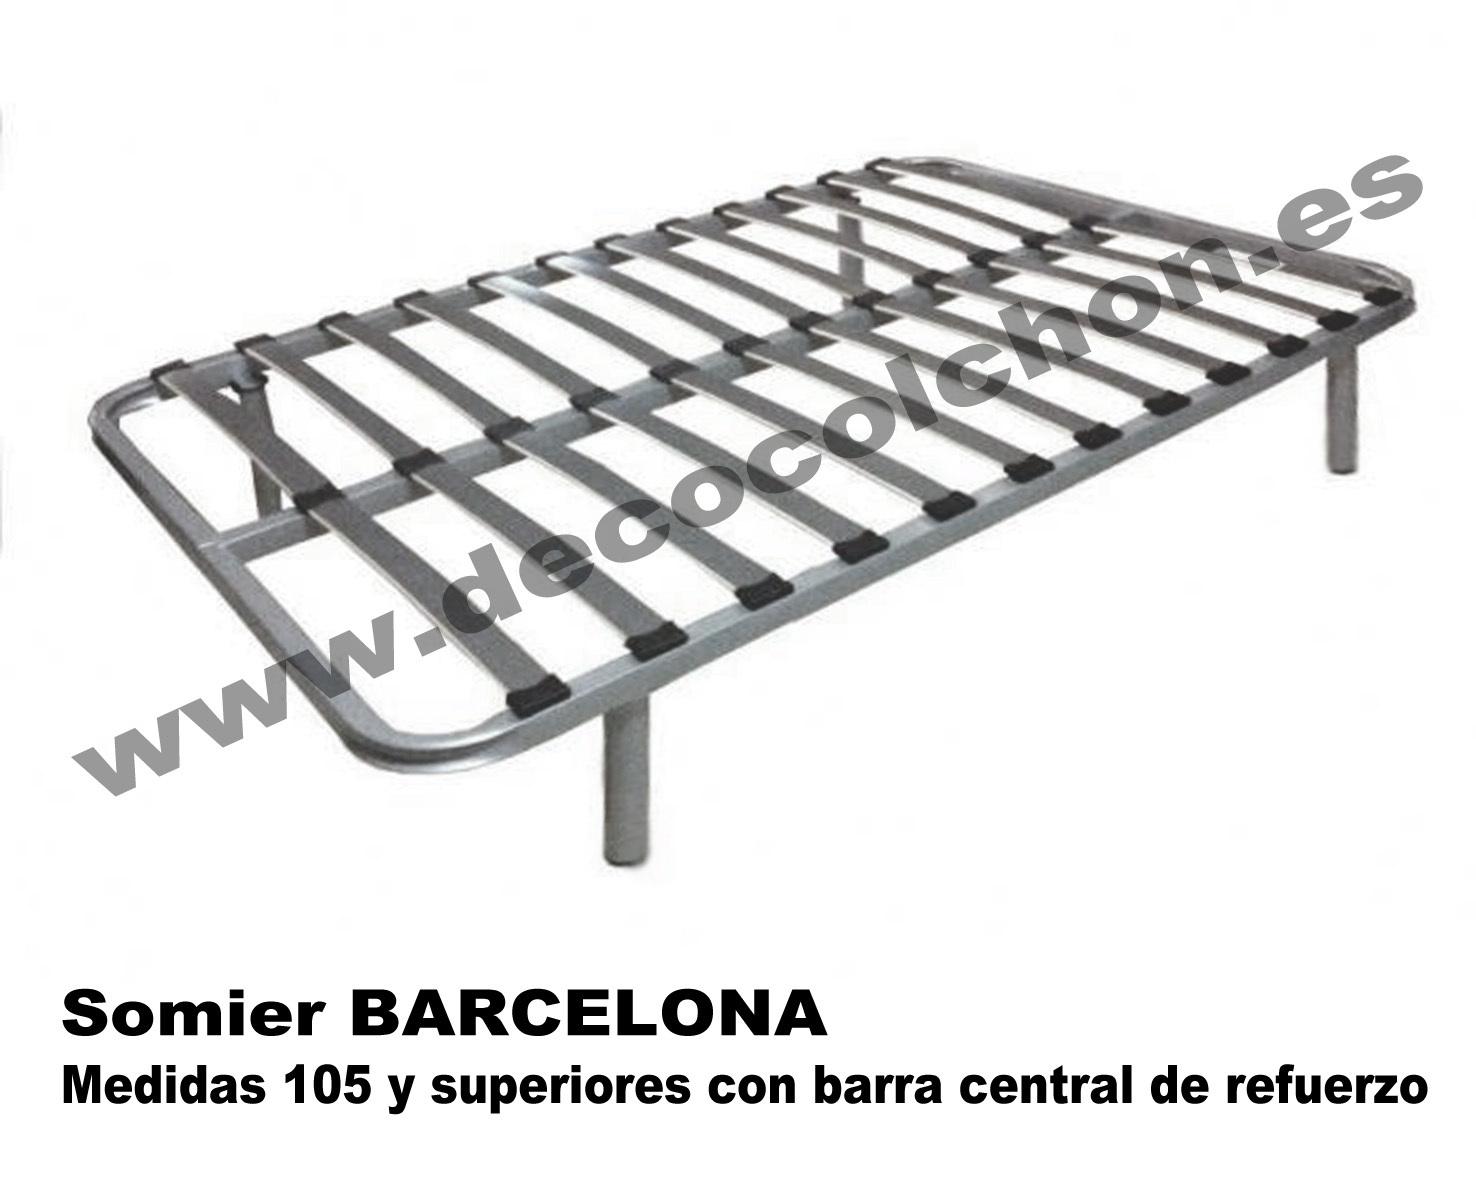 Somier barcelona somier base canap camas y colchones for Camas canape barcelona